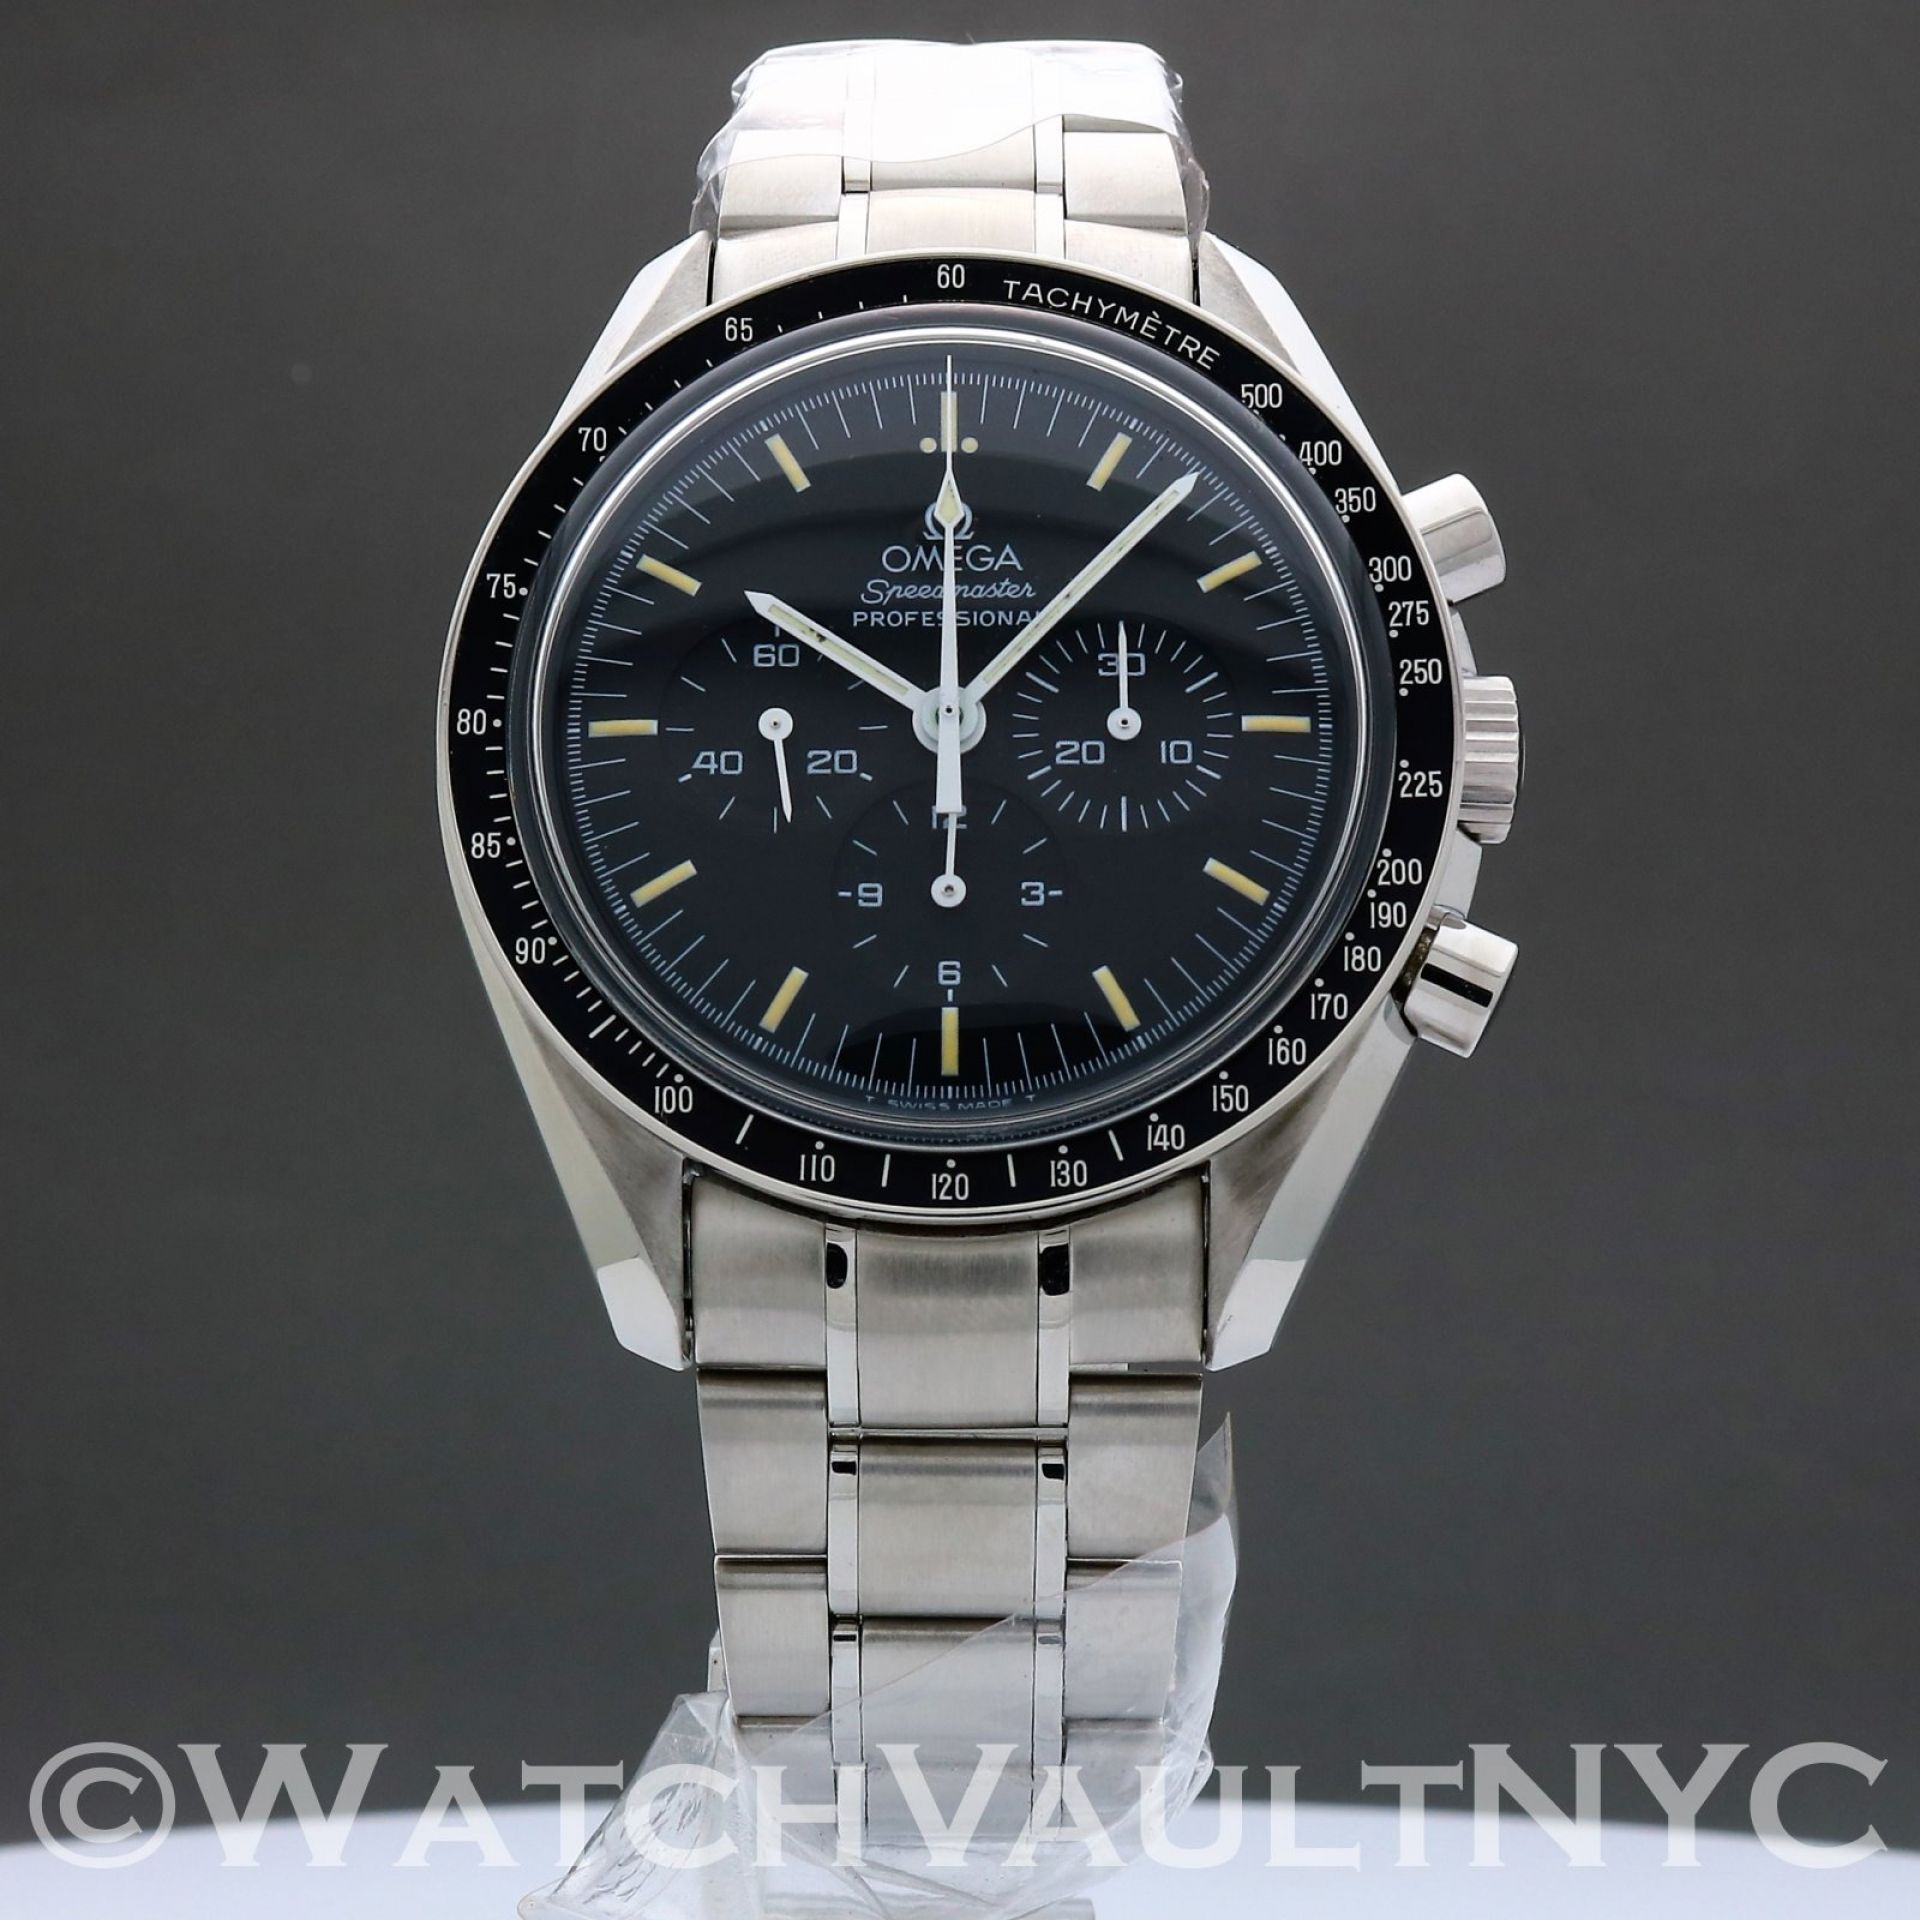 Omega Speedmaster Professional 3590.50 Moonwatch 1990 Vintage 42mm Manual SC212